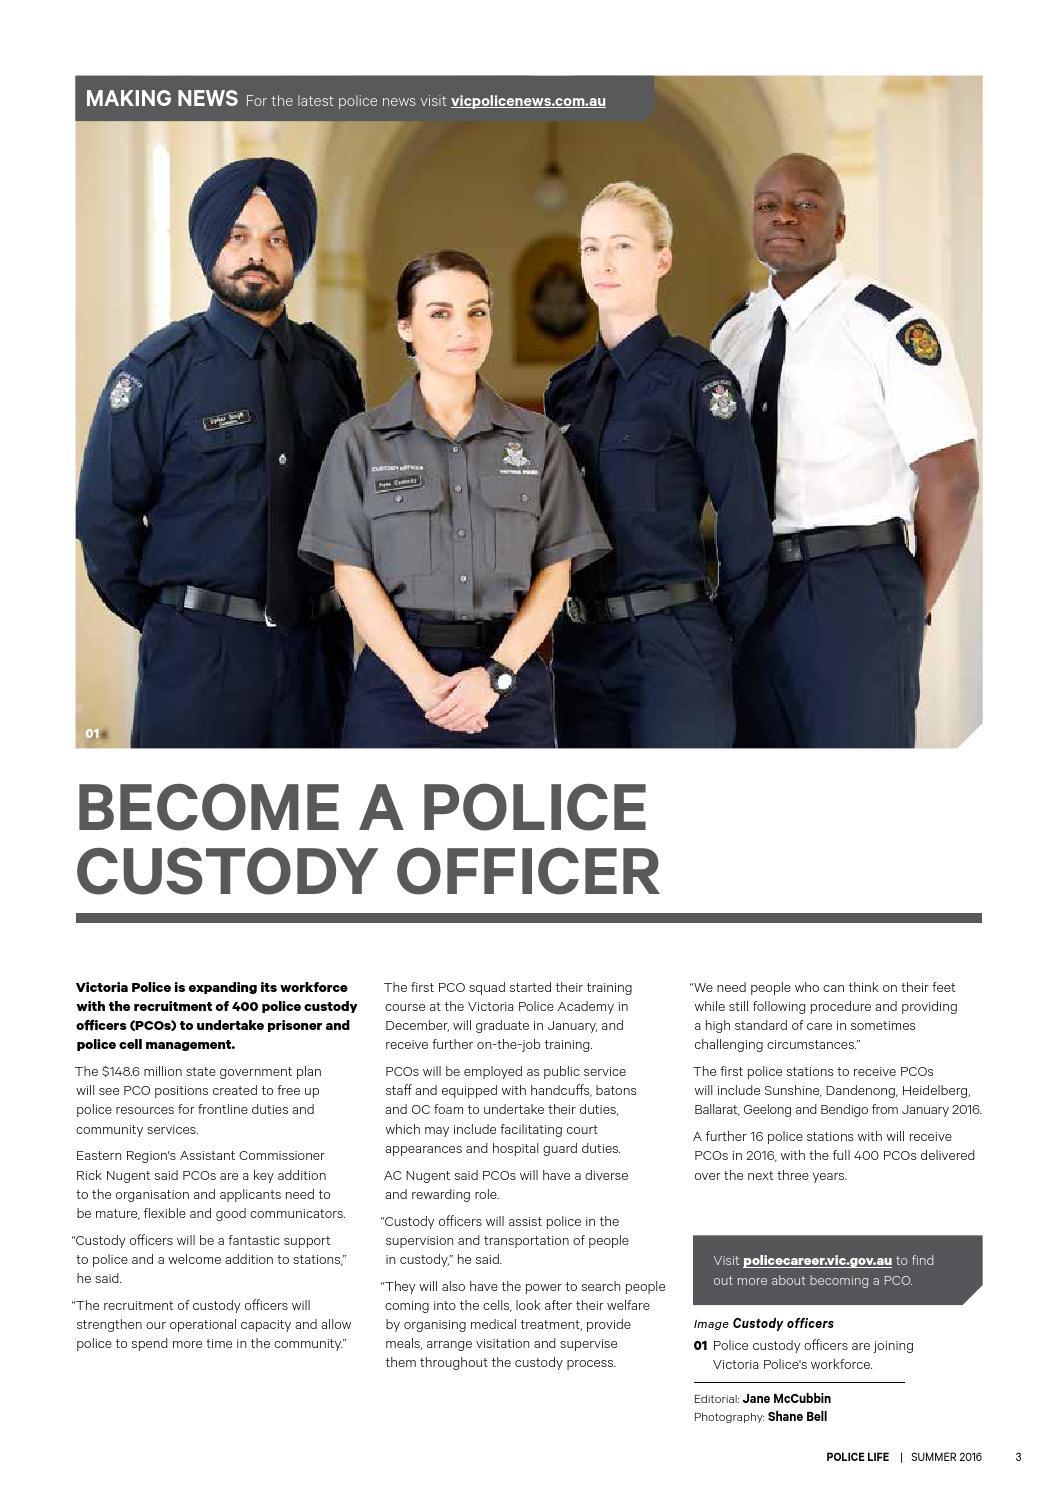 Police custody officer PCO application Jobs 1119664 ... - photo#43